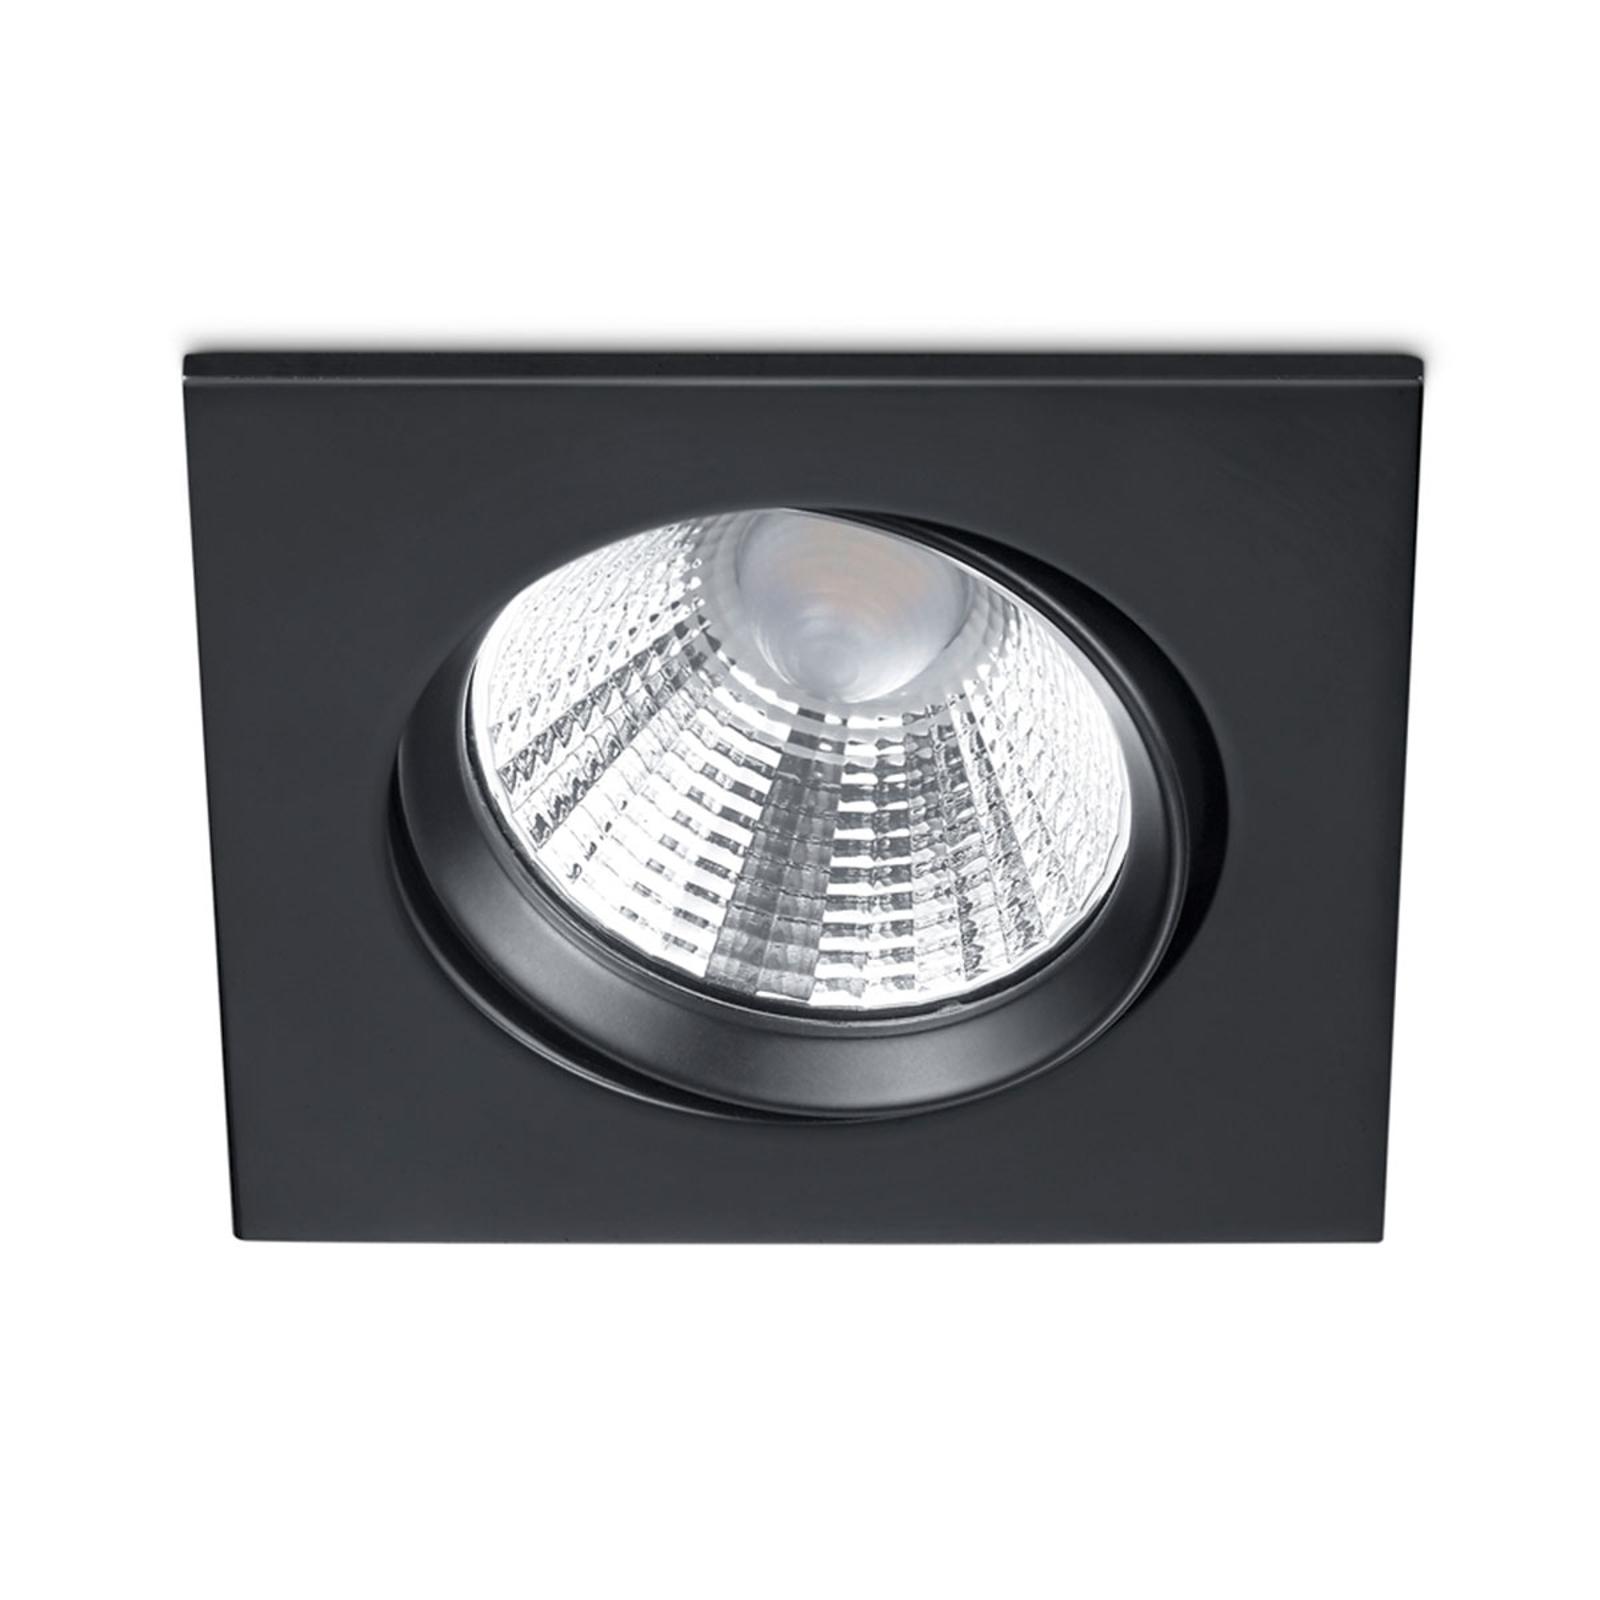 Downlight LED Pamir dimmerabile, nero satinato